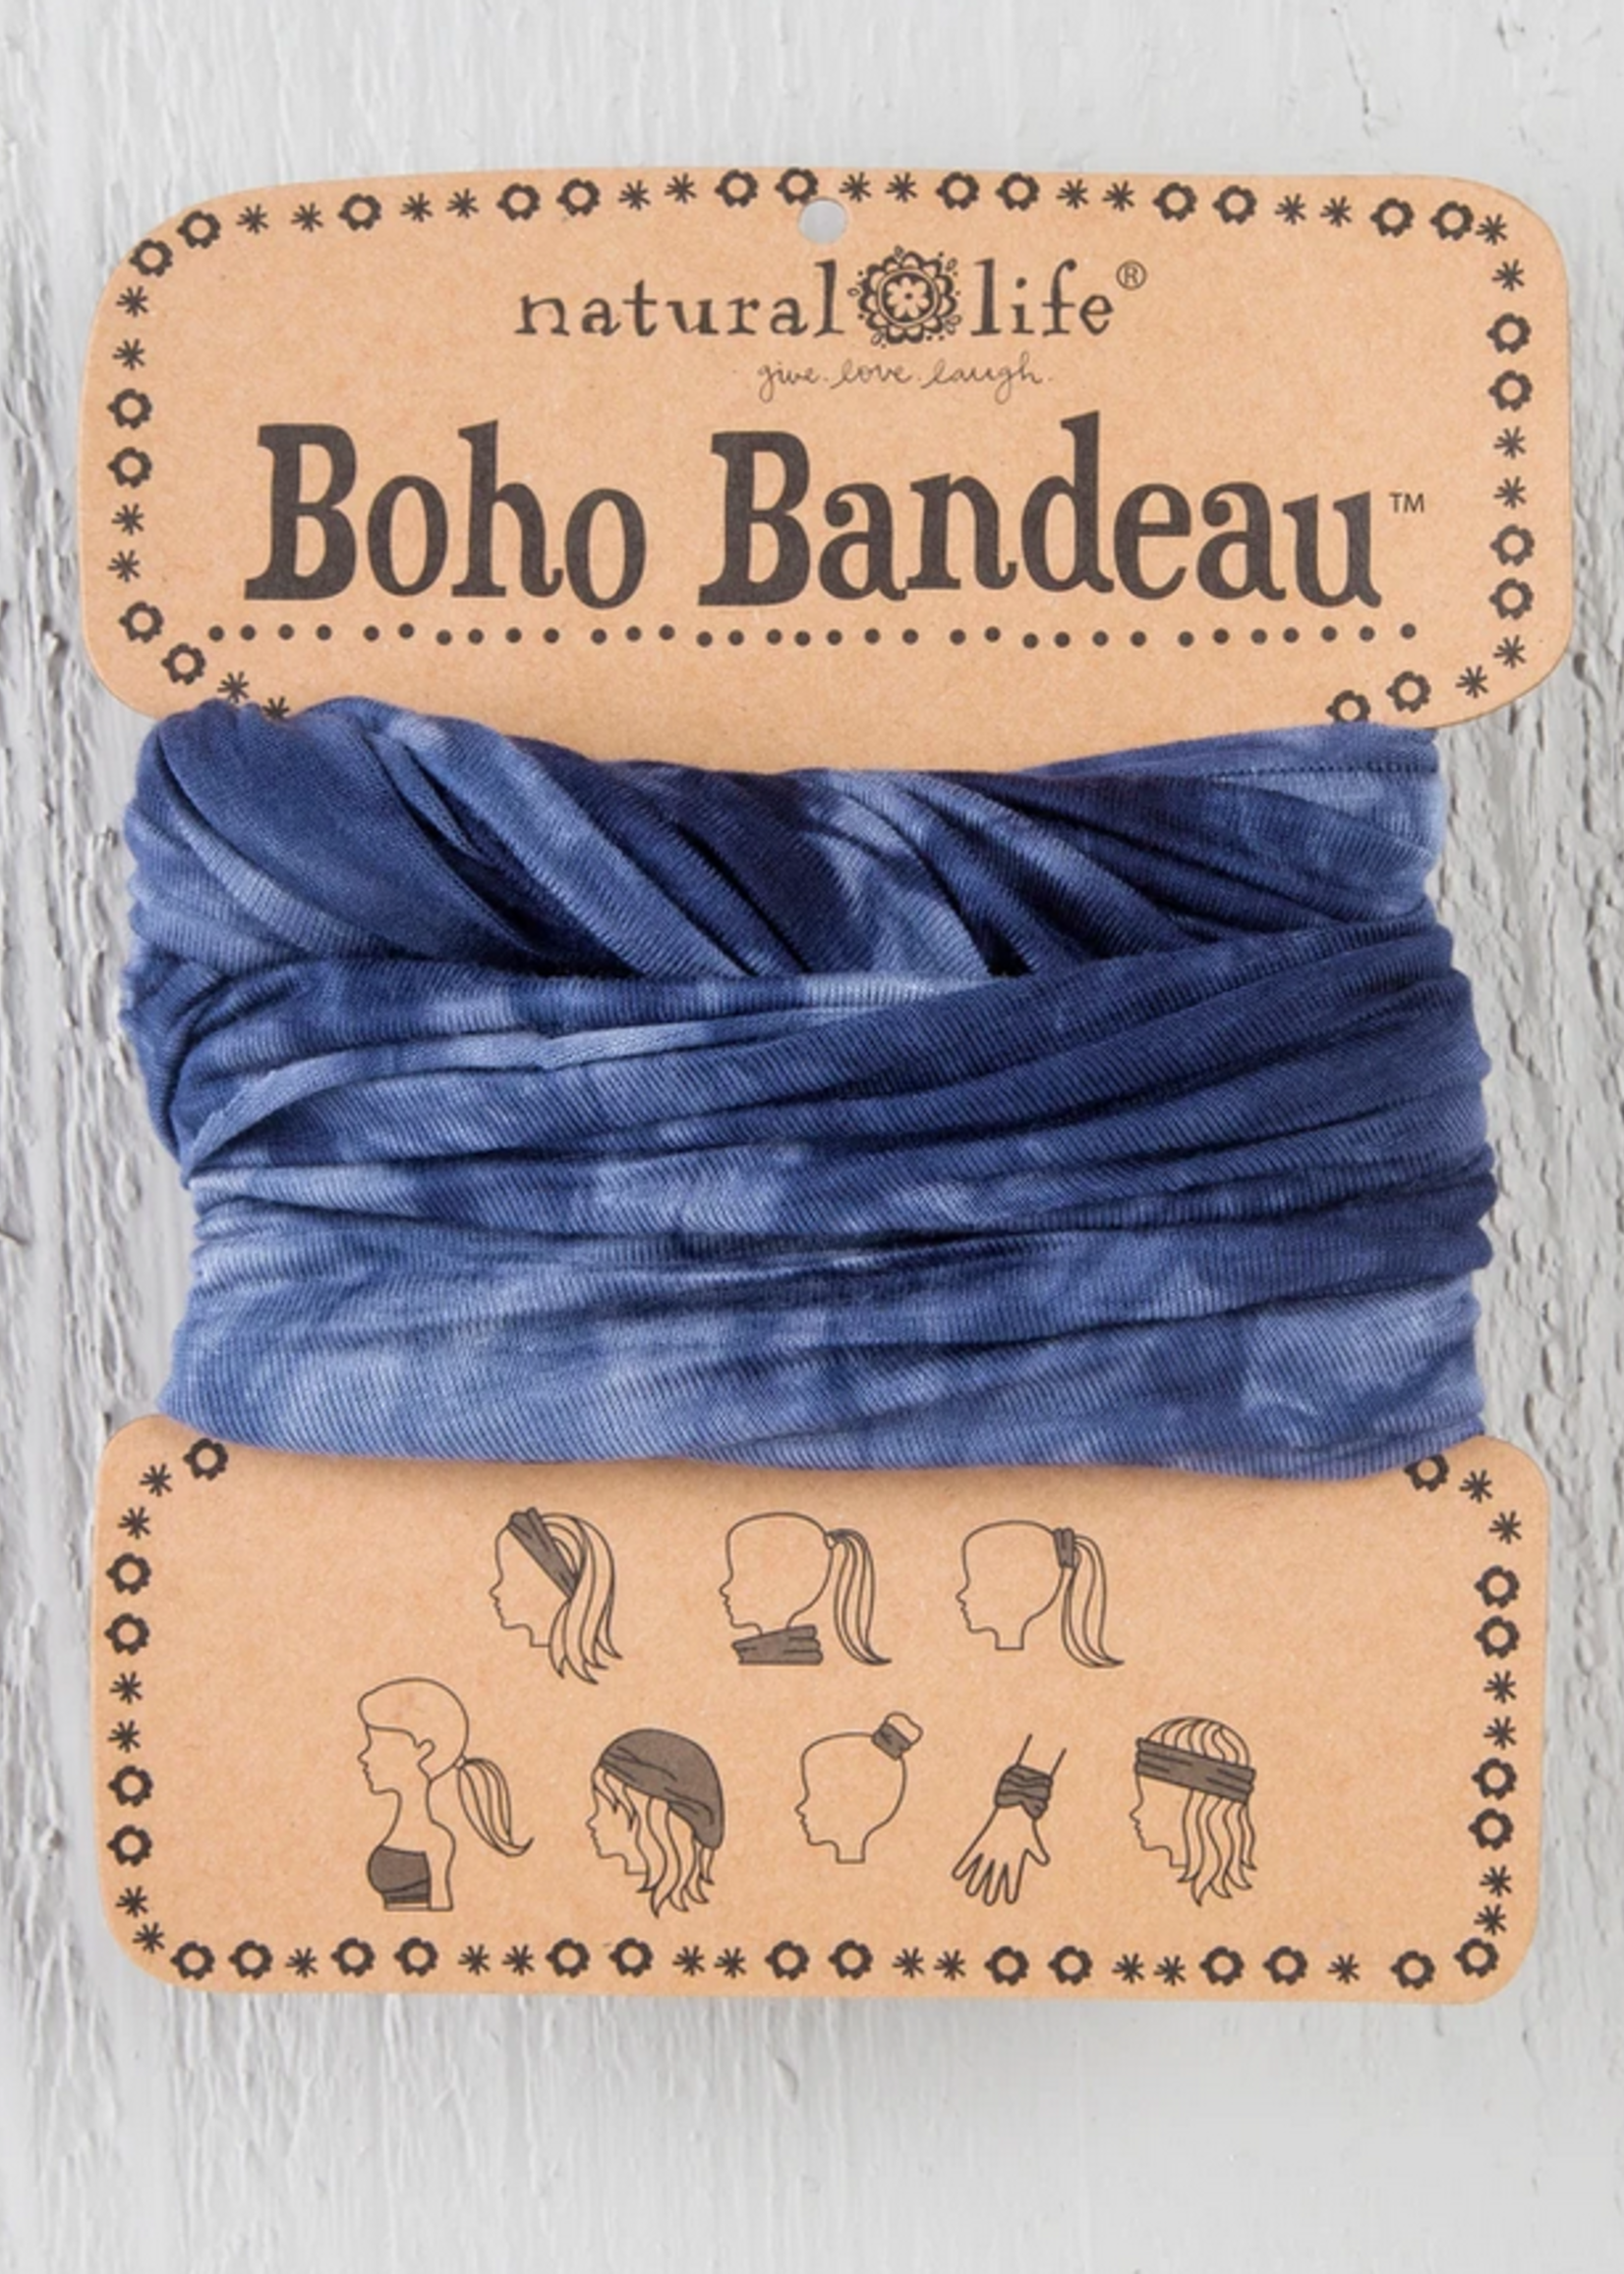 natural life tie-dye navy boho bandeau